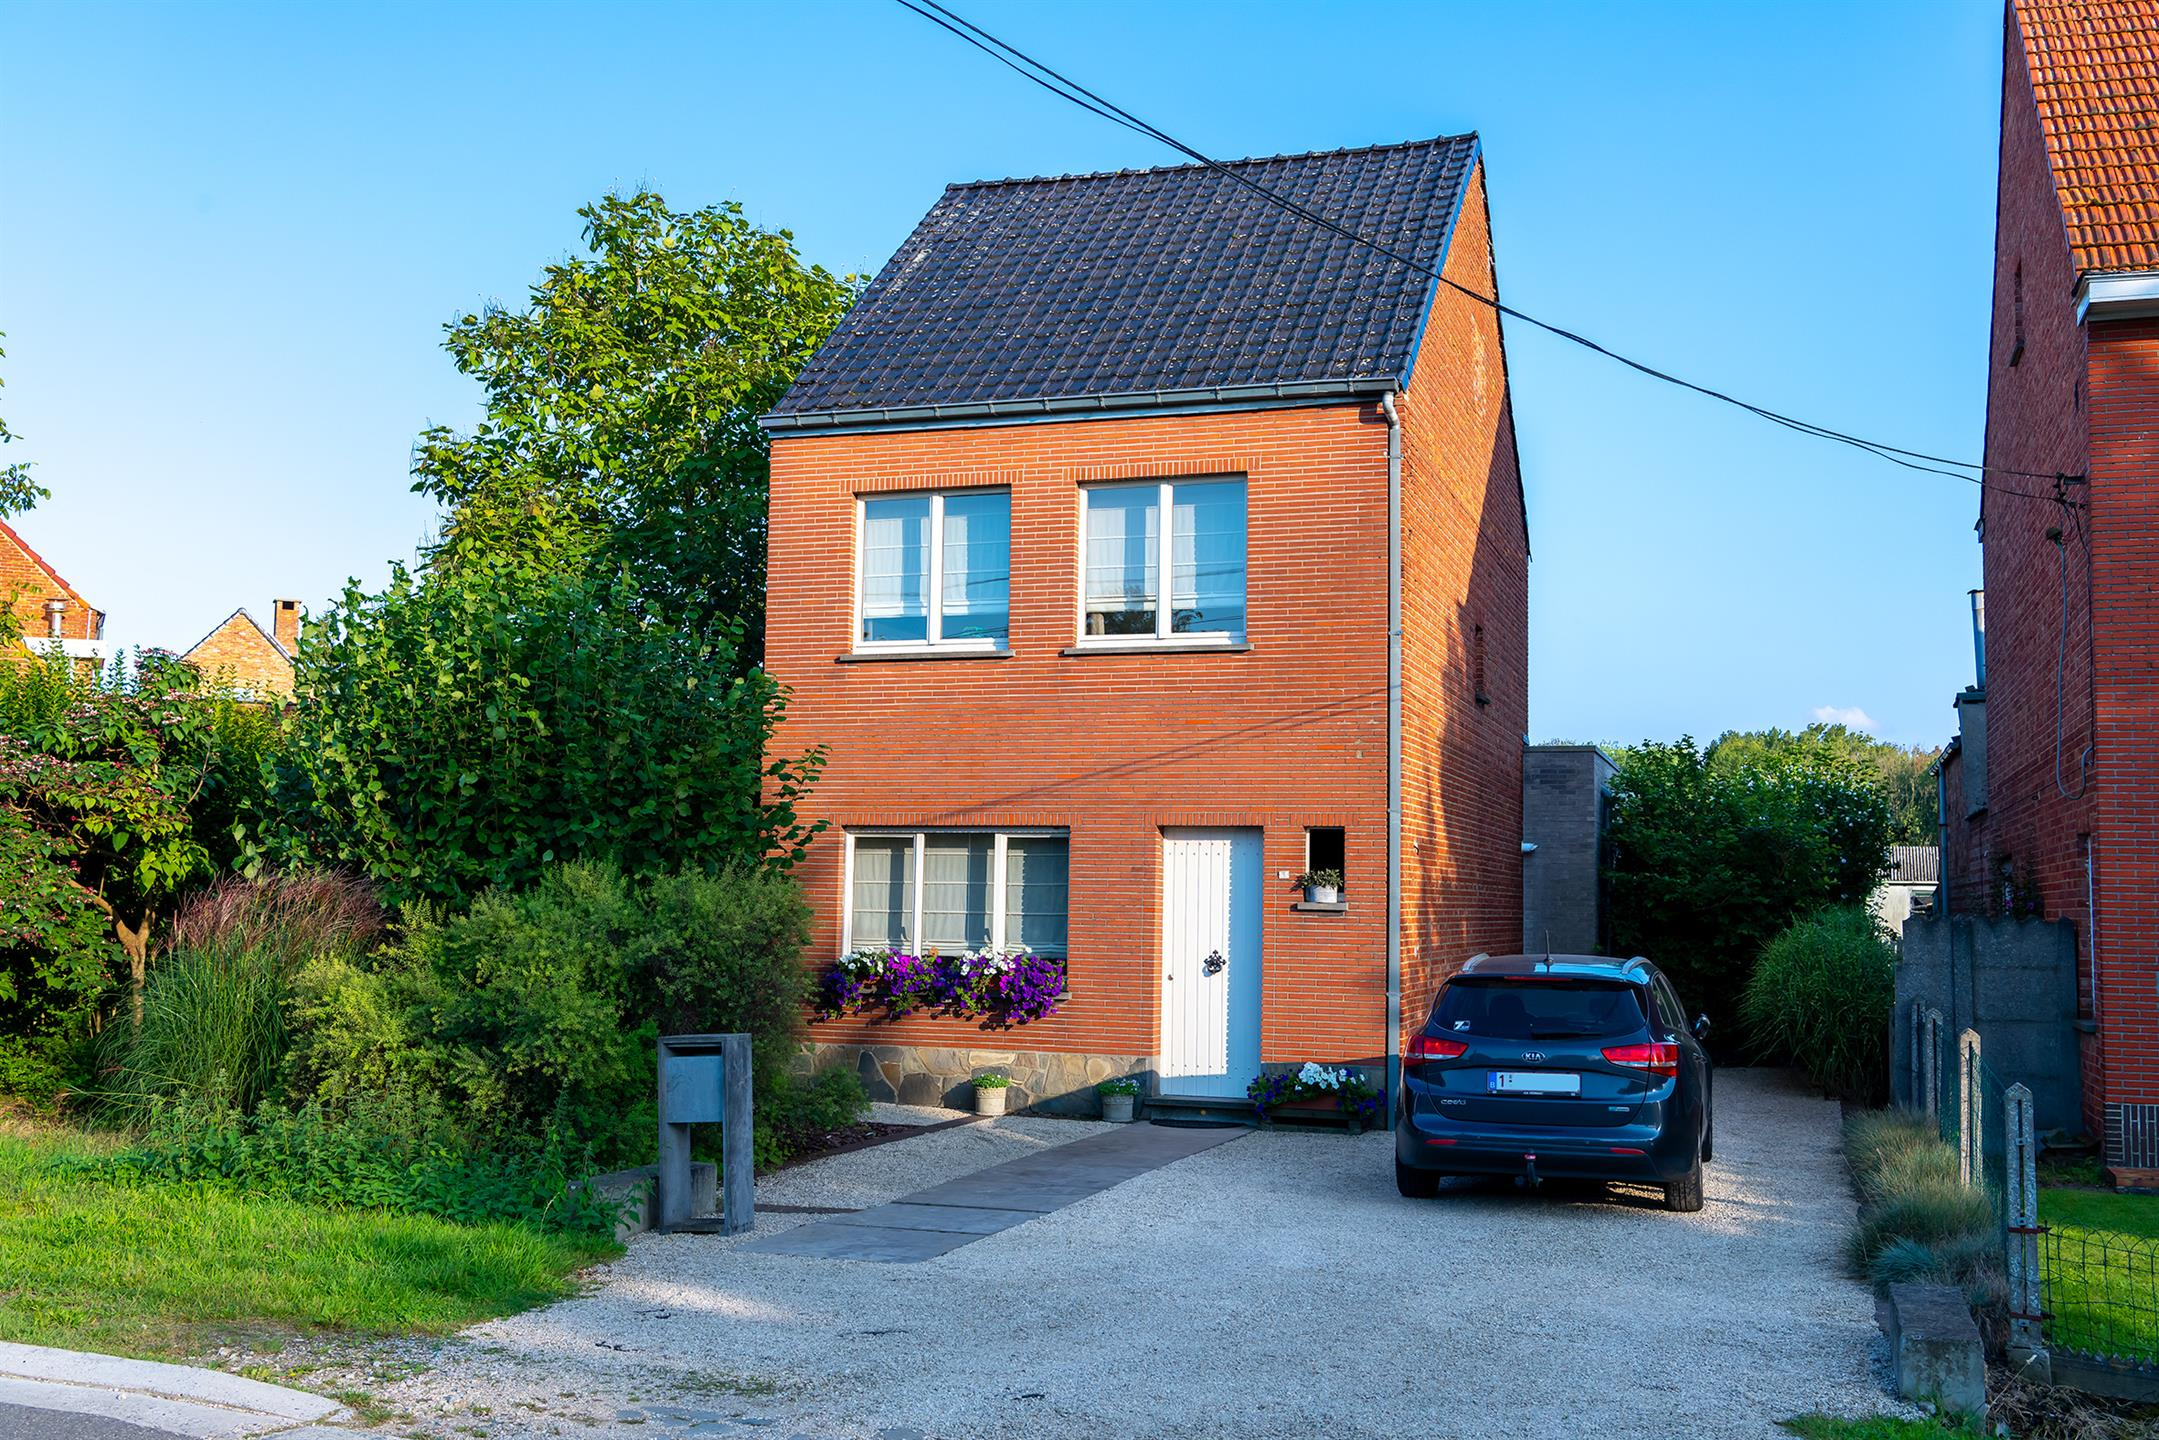 Charmant huis - Sint-Katelijne-Waver - #4492892-0